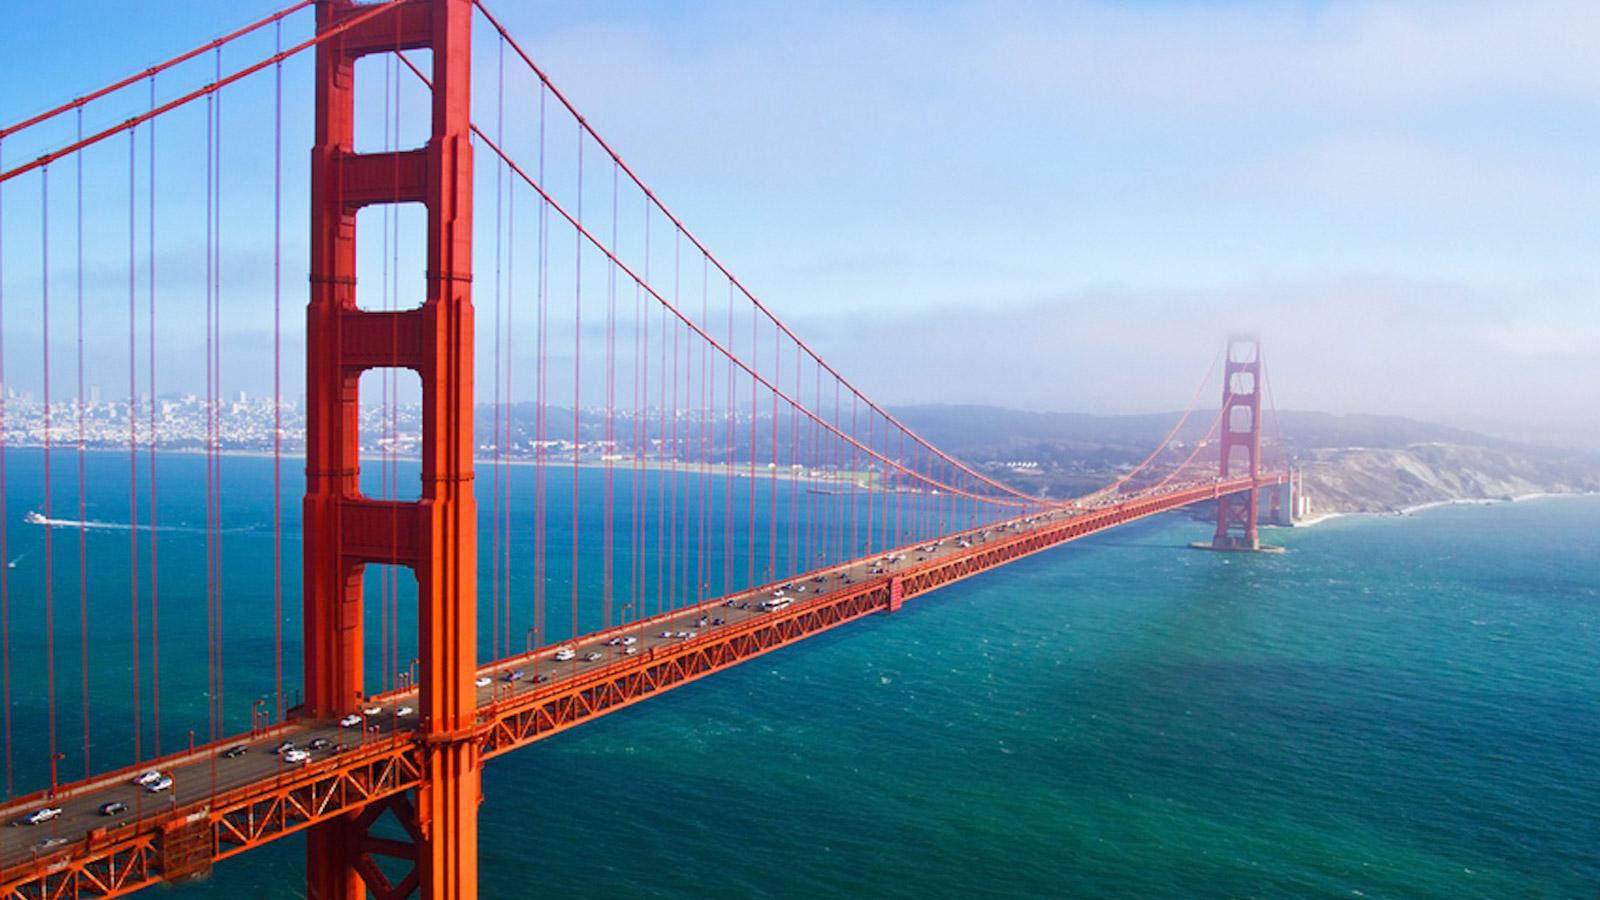 San fran golden gate bridge with blue water beneath it